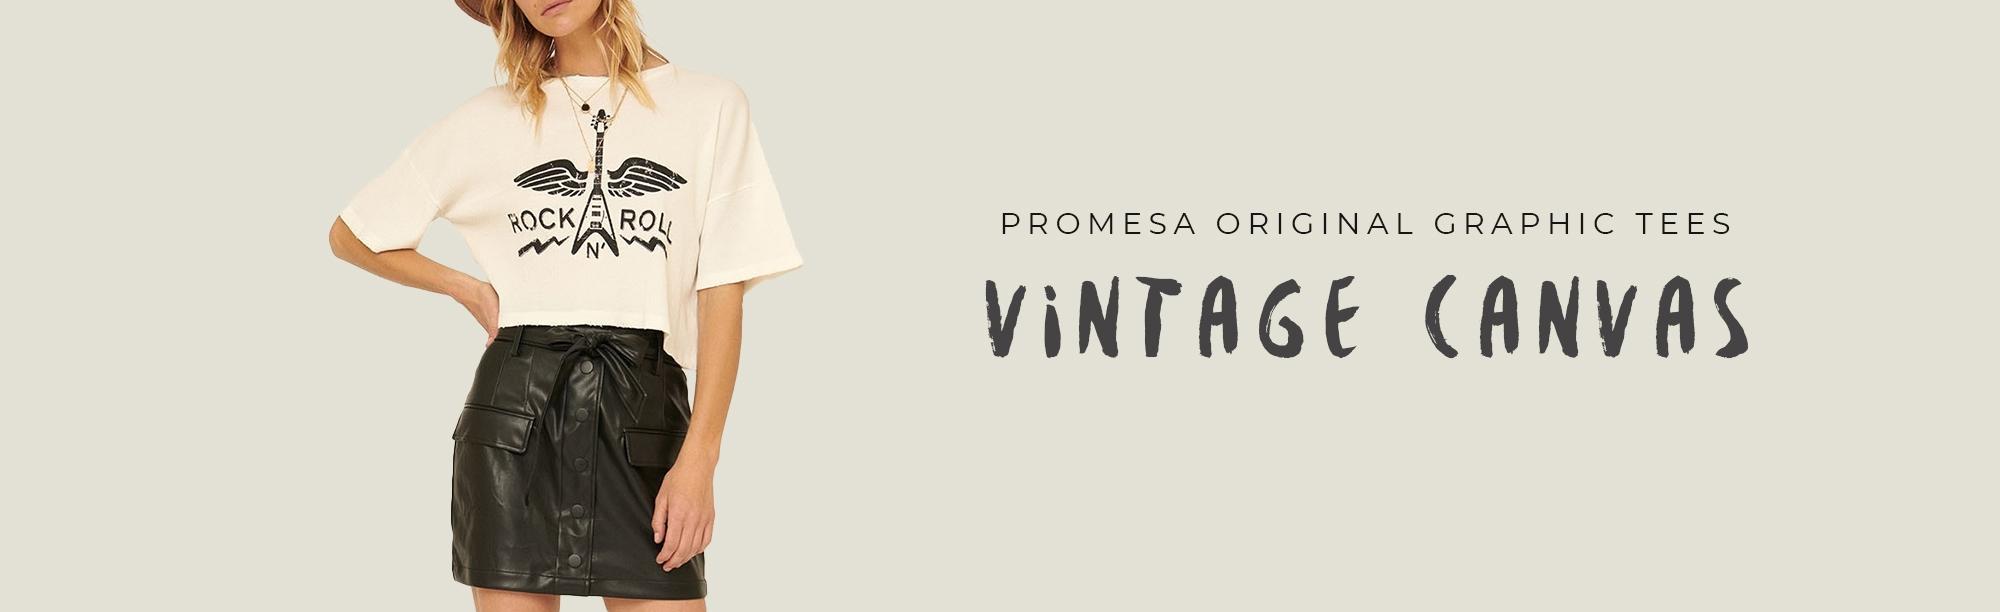 Promesa Original Graphic Tees